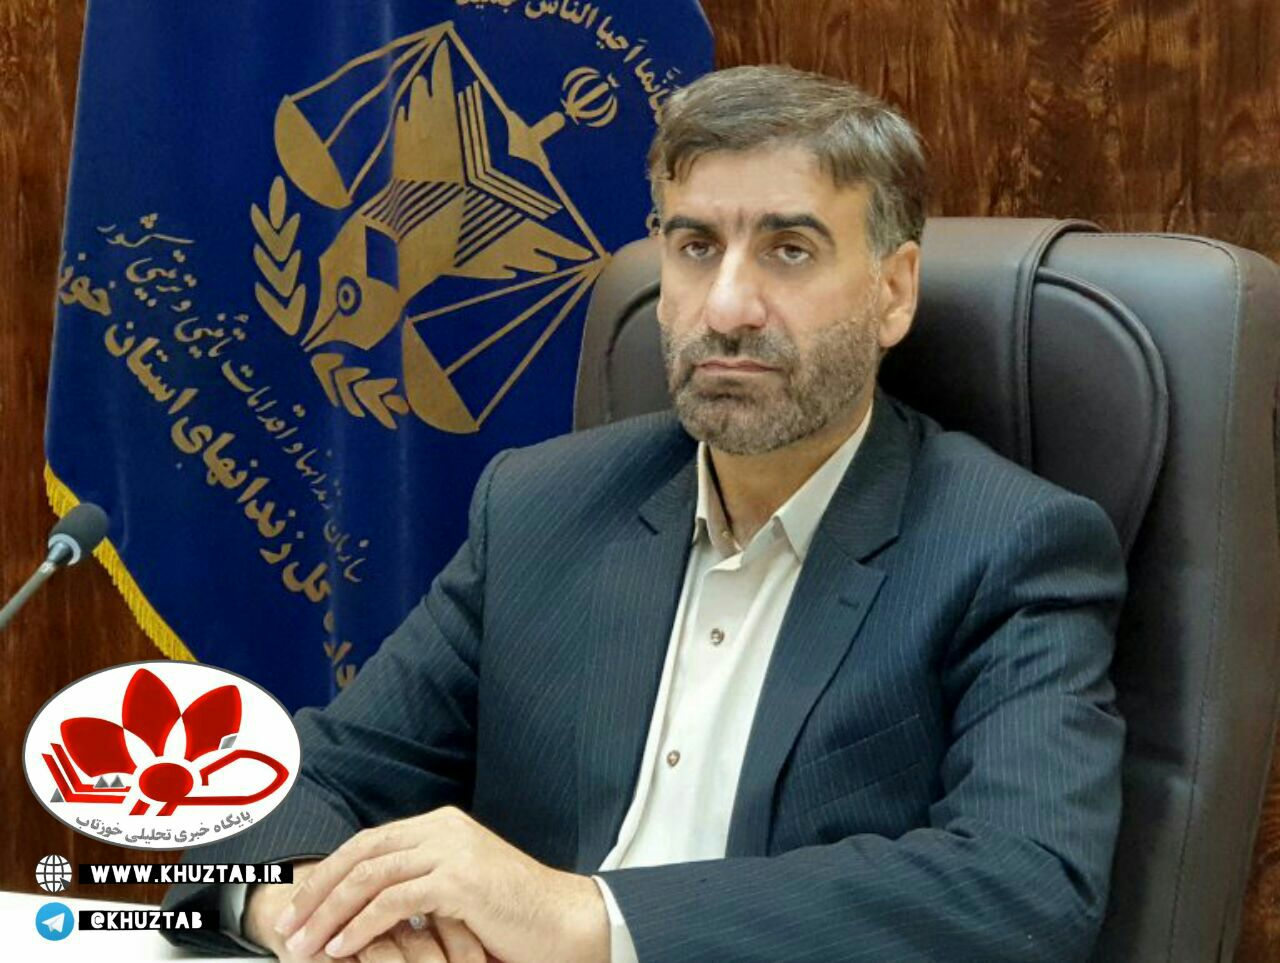 IMG 20200617 053926 848 سرپرست اداره کل زندانهای خوزستان منصوب شد